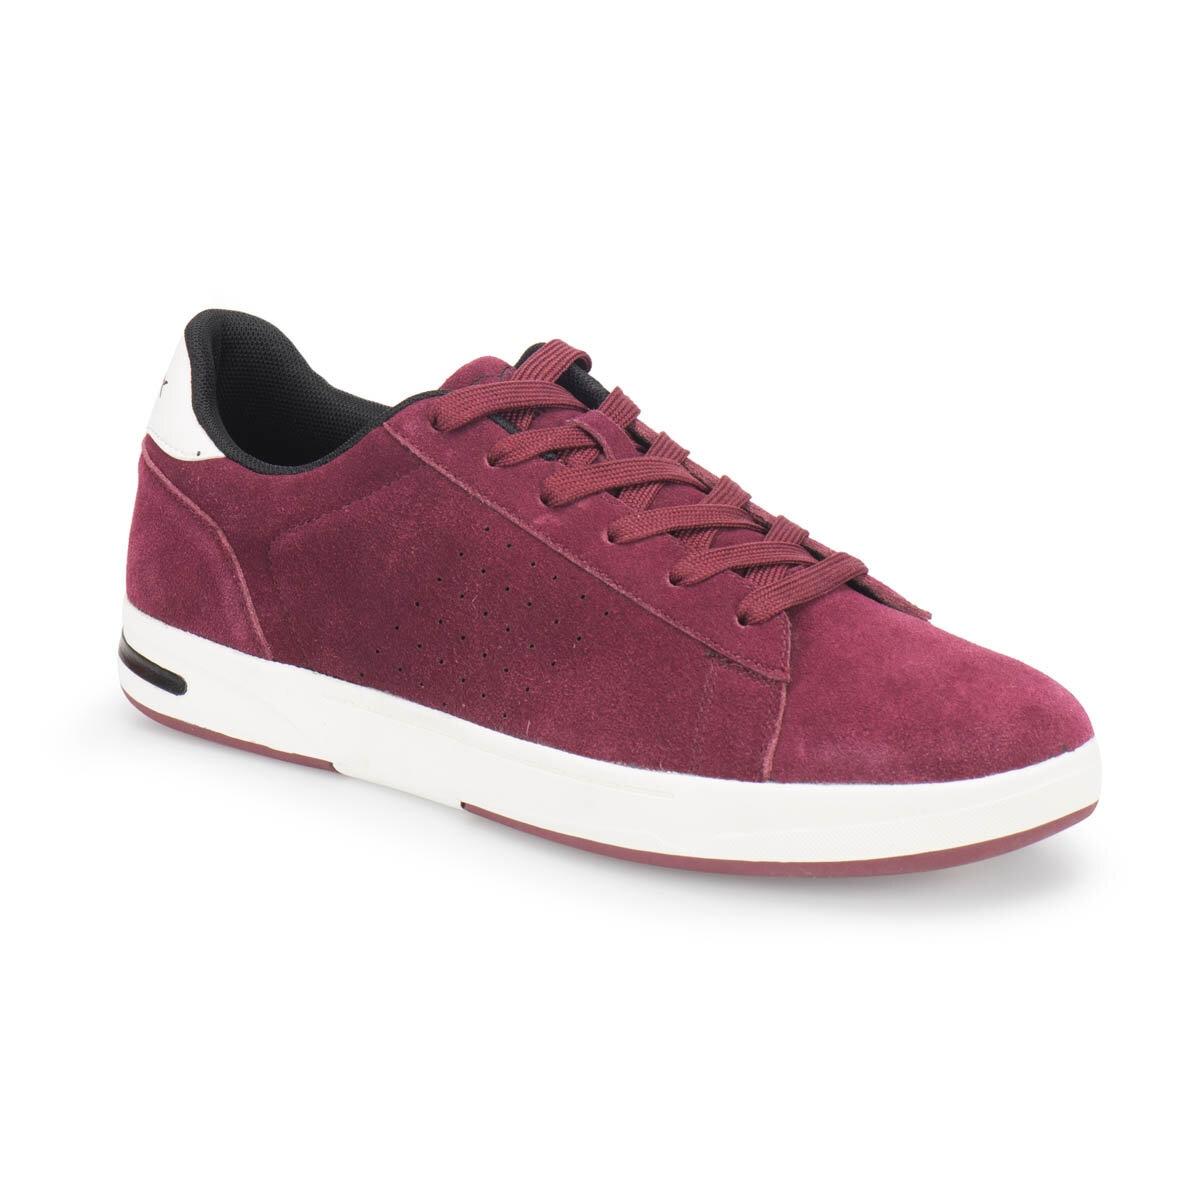 FLO HELDER L M Burgundy Men 'S Sneaker Shoes KINETIX